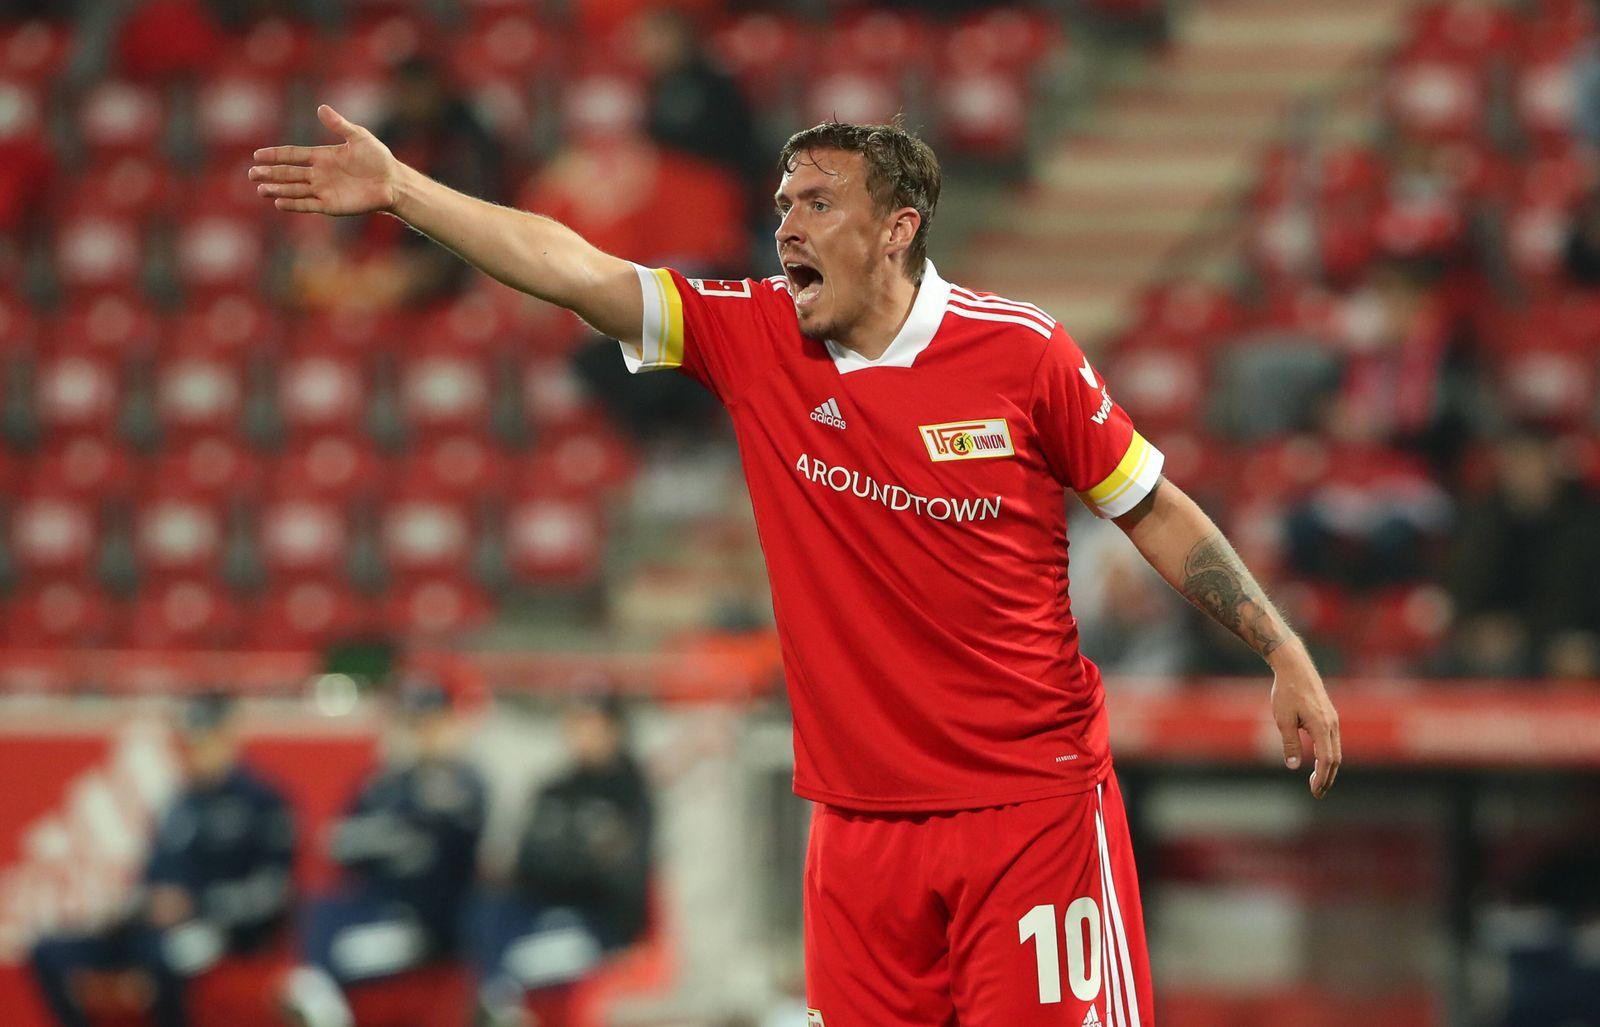 Max Kruse zeigend, gestikulierend / Aktion / Oberkoerper Oberkörper / / Fußball Fussball / DFL Bundesliga Herren / Sais